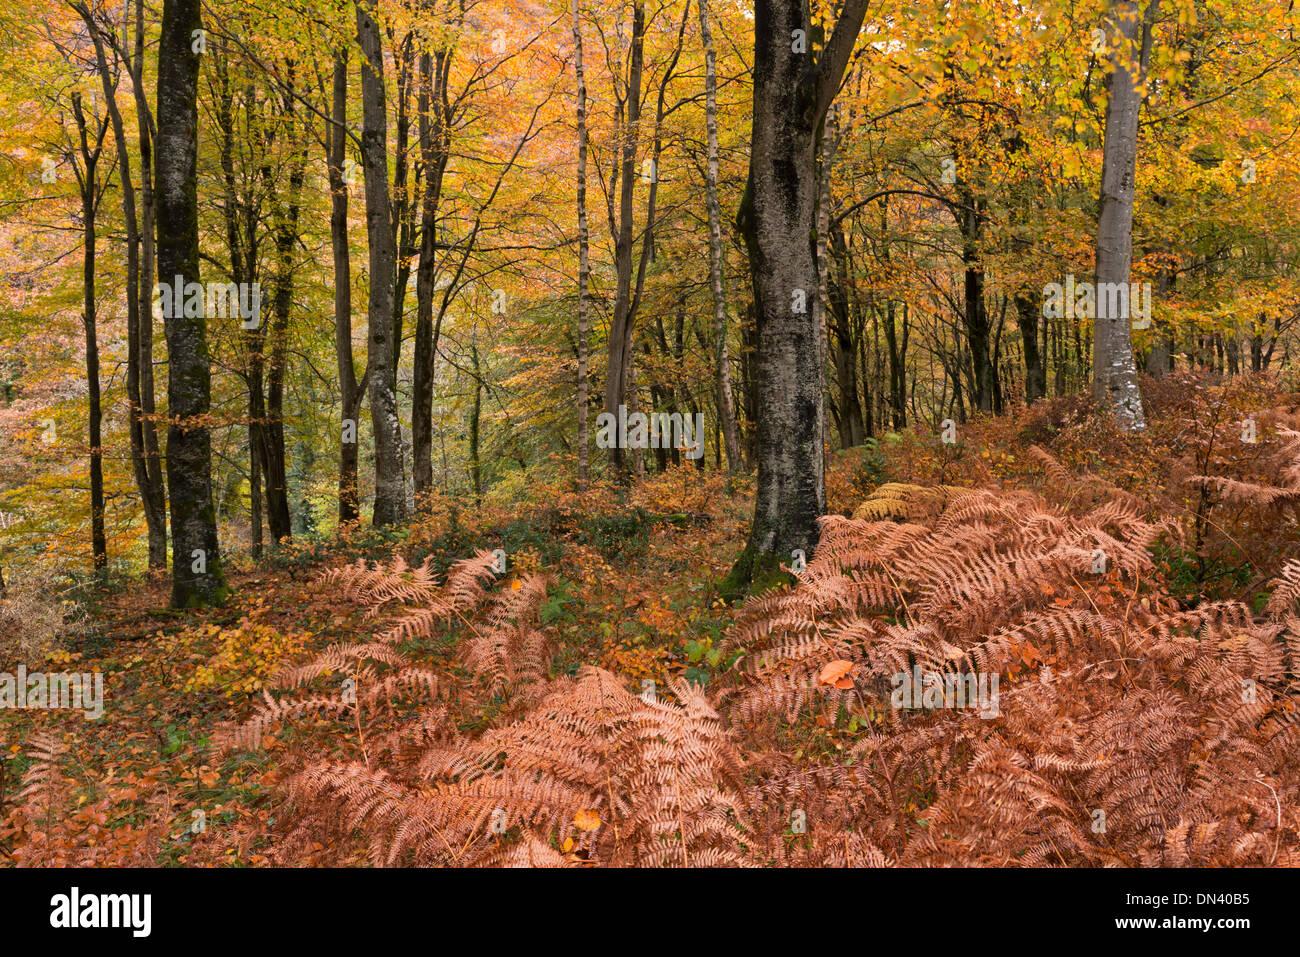 Deciduous woodland in autumn, Exmoor, Devon, England. November 2013. - Stock Image